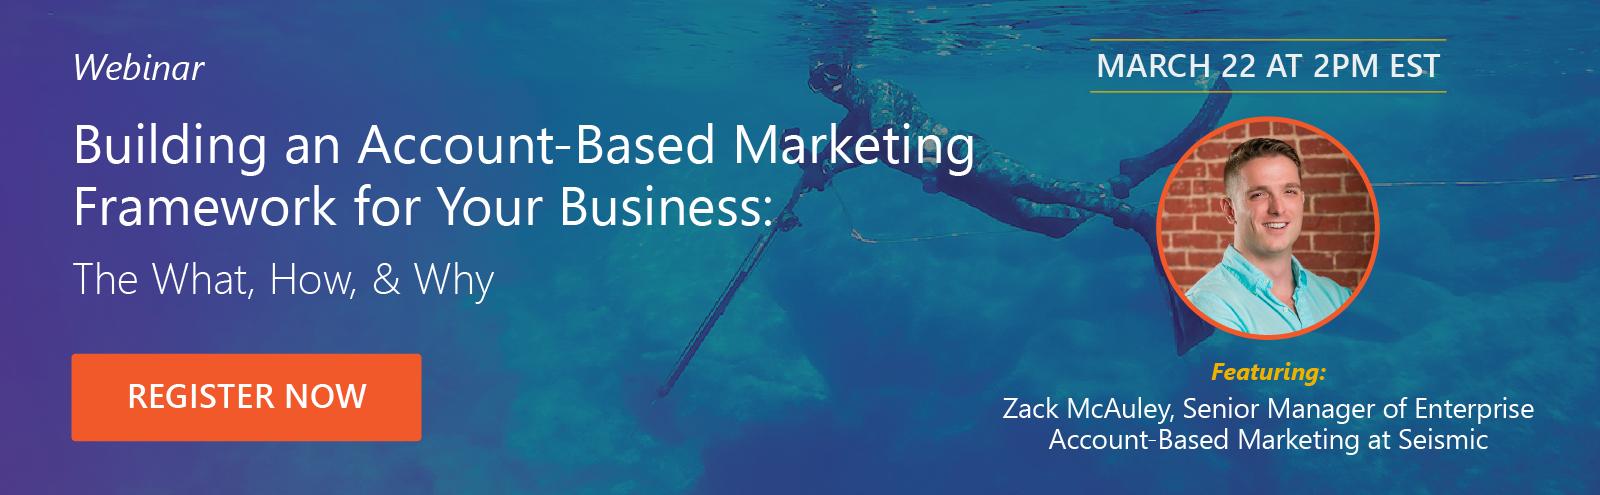 Building an Account-Based Marketing Framework